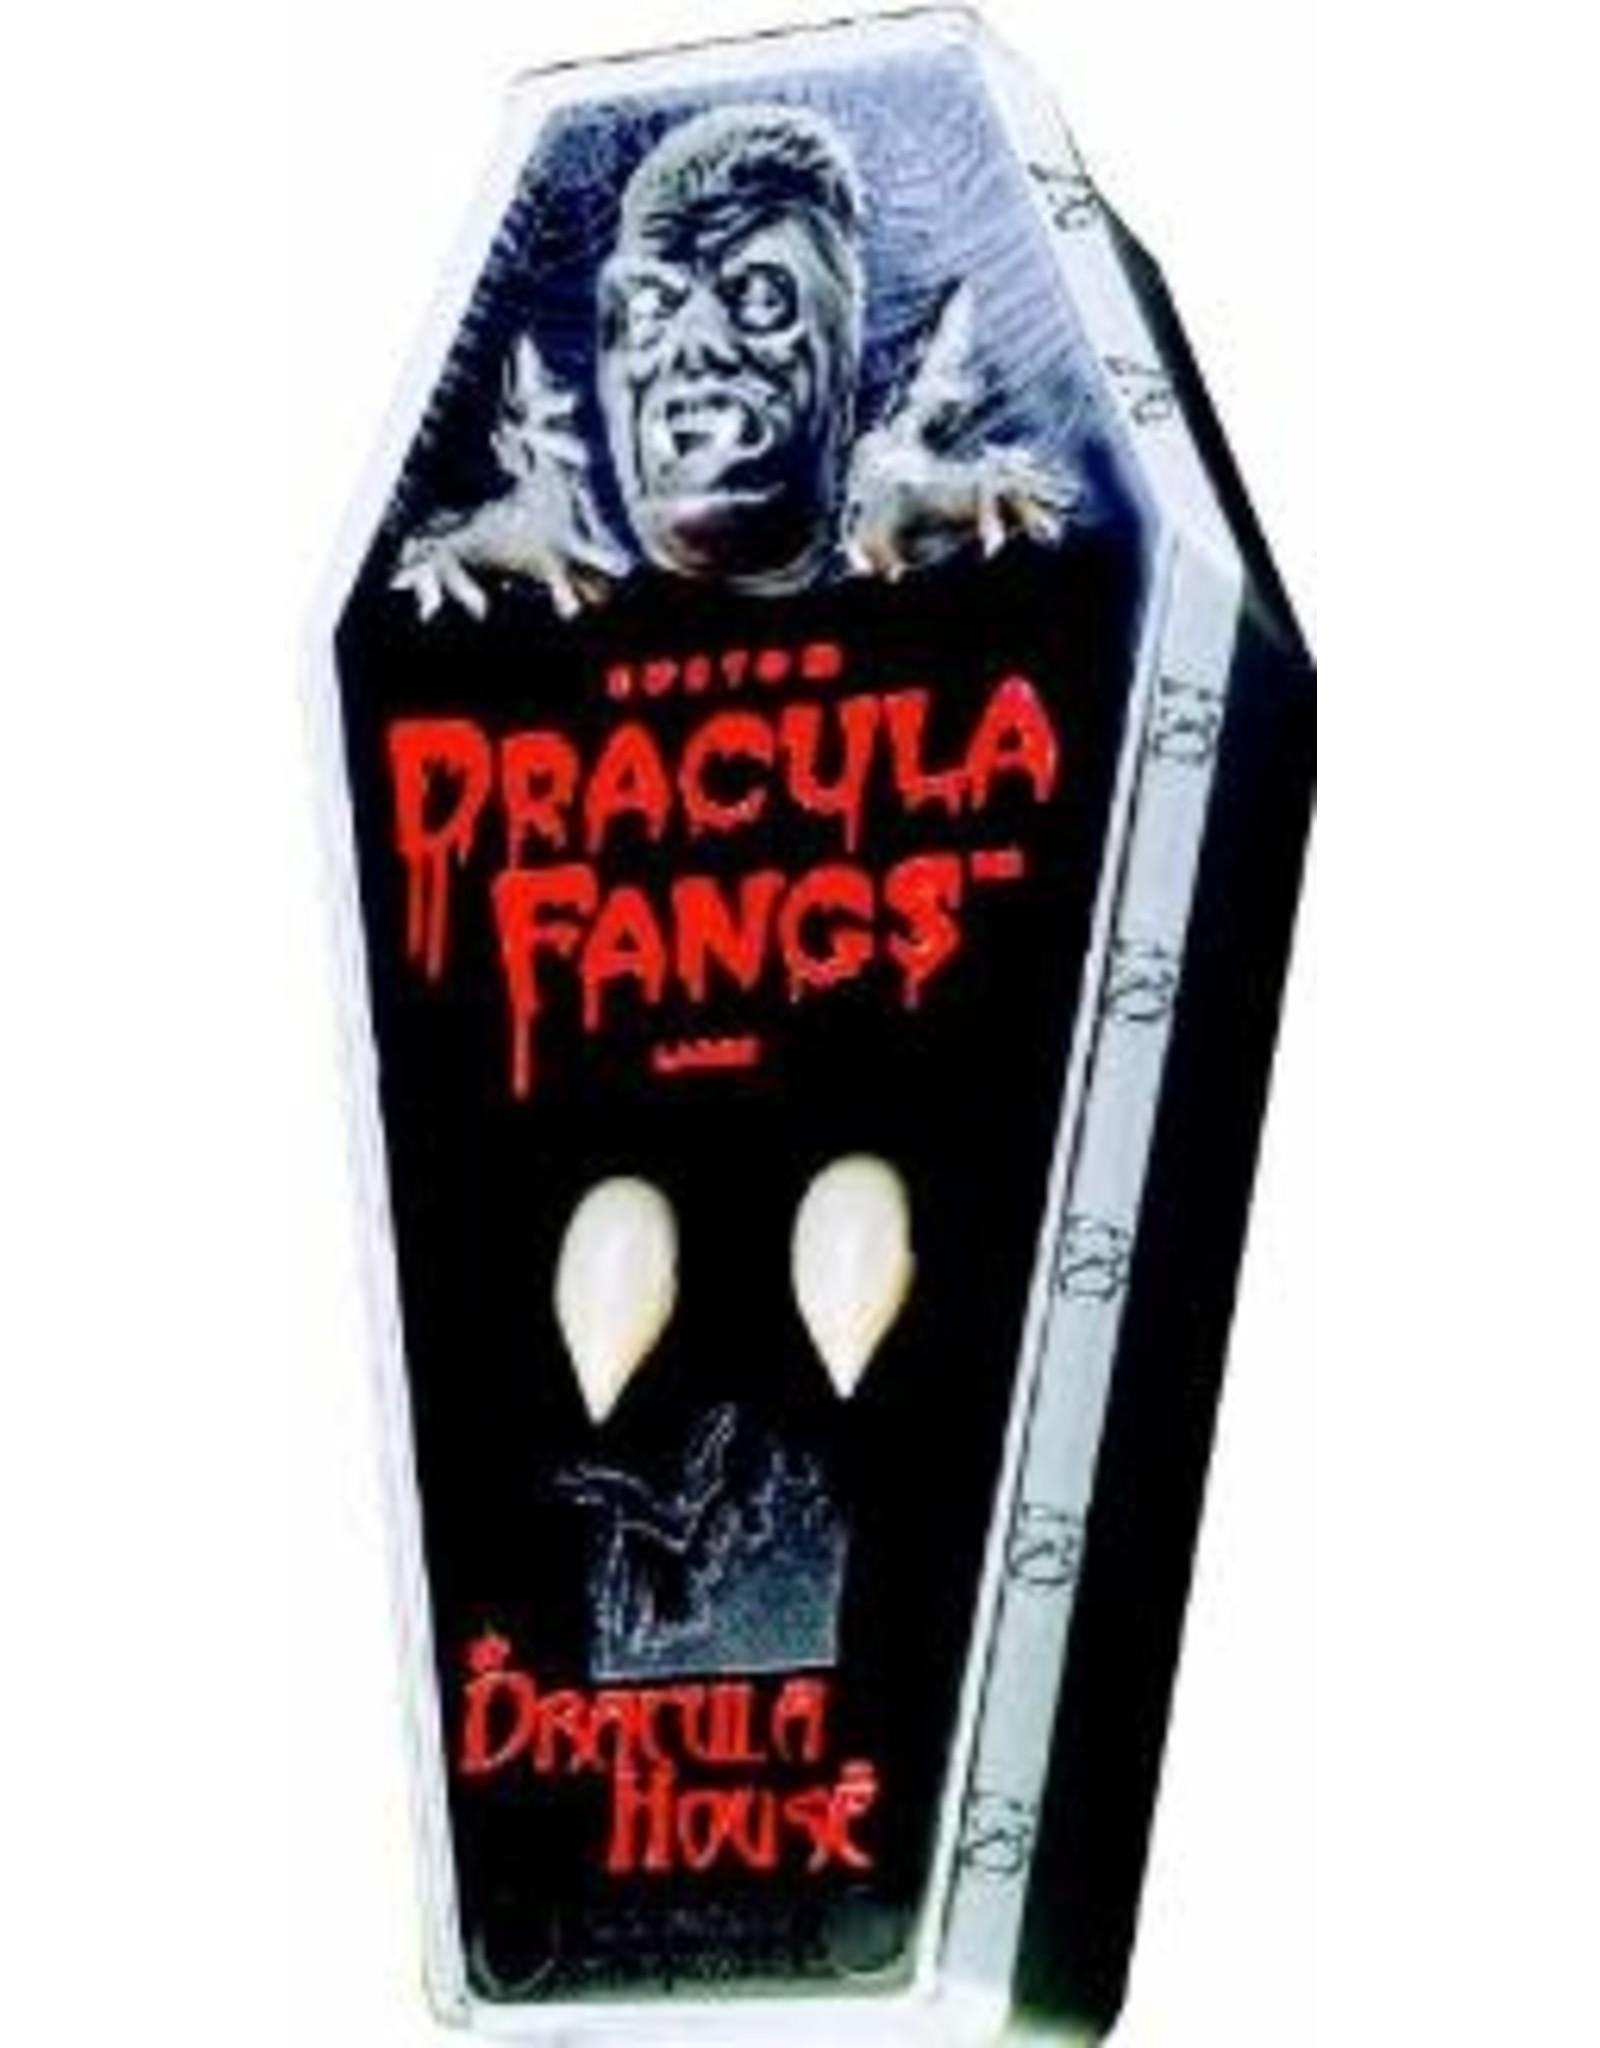 Foothills Fangs Dracula Fangs